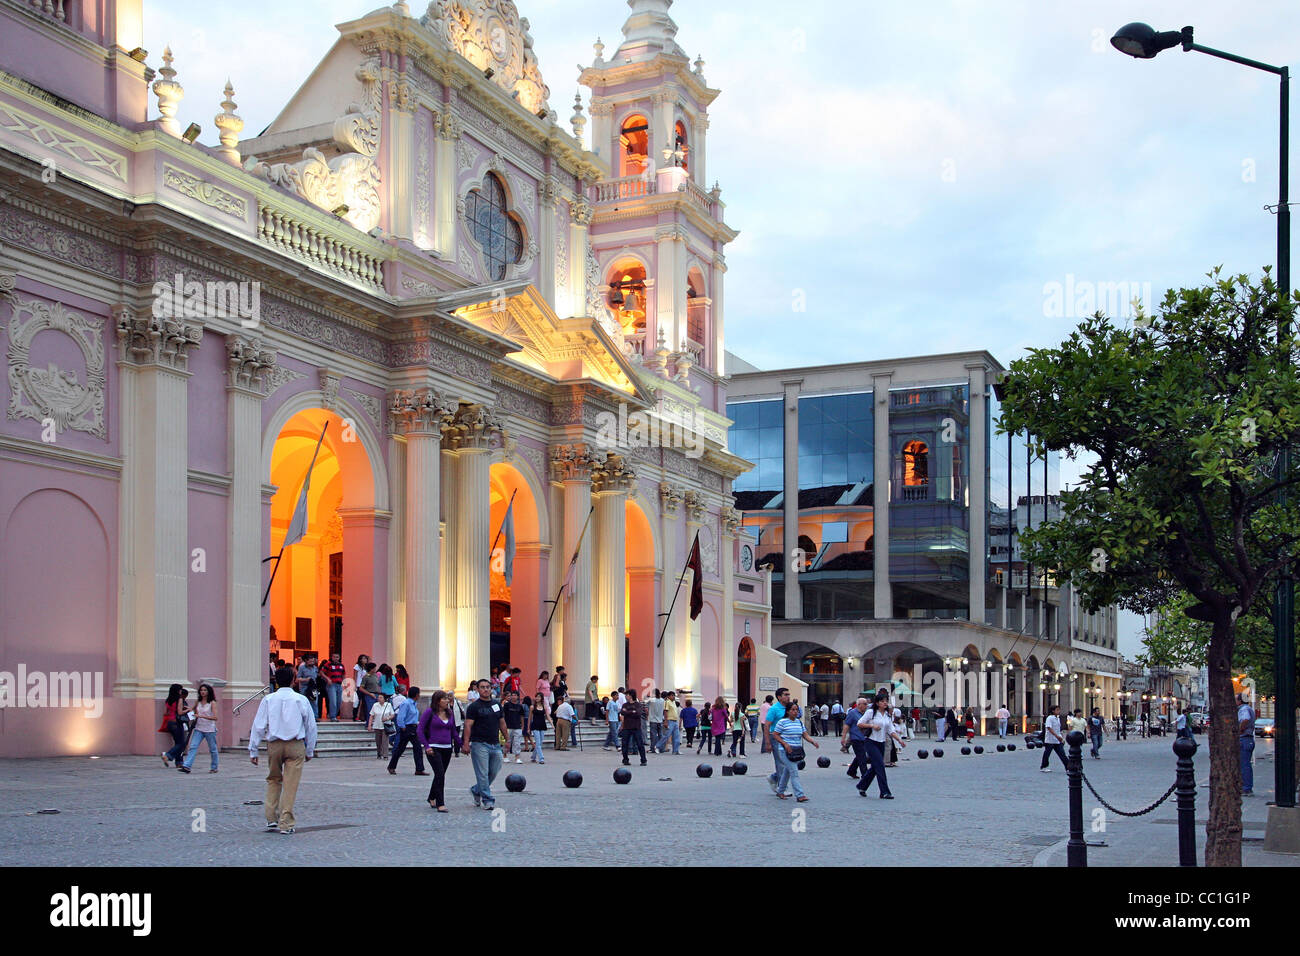 The Church of Saint Francis / Iglesia San Francisco in Salta, Argentina - Stock Image